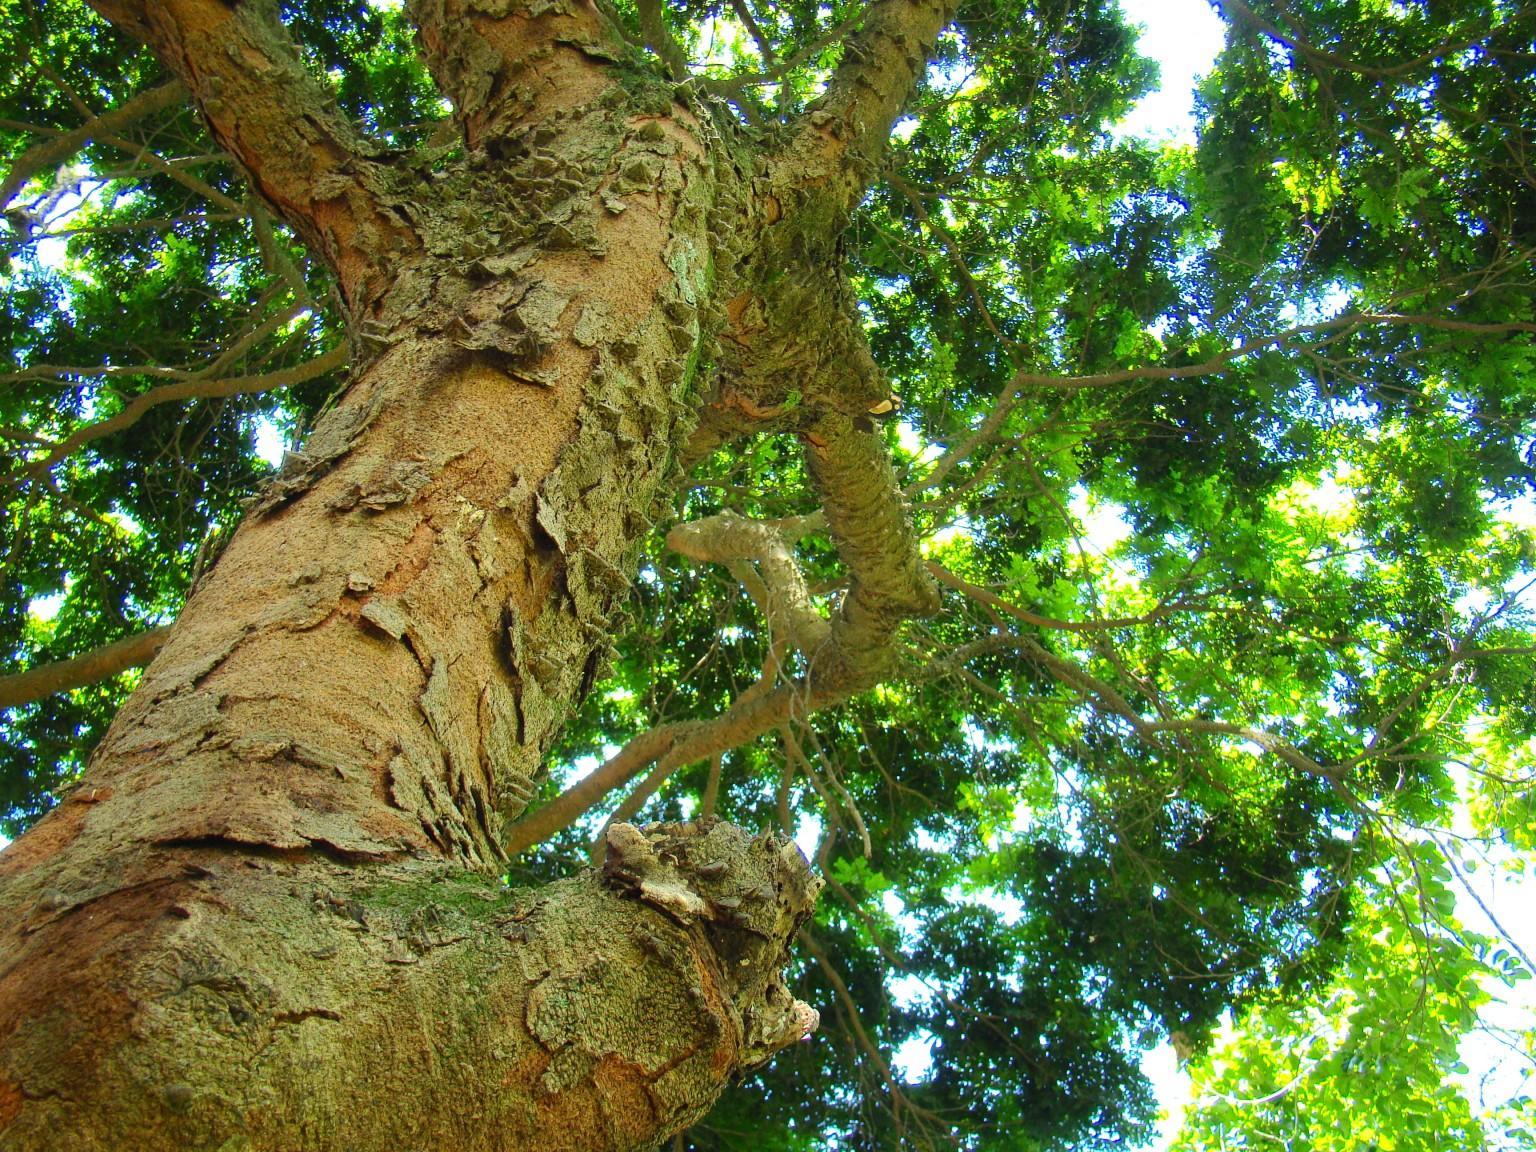 Pau-Brasil (Caesalpinia echinata)